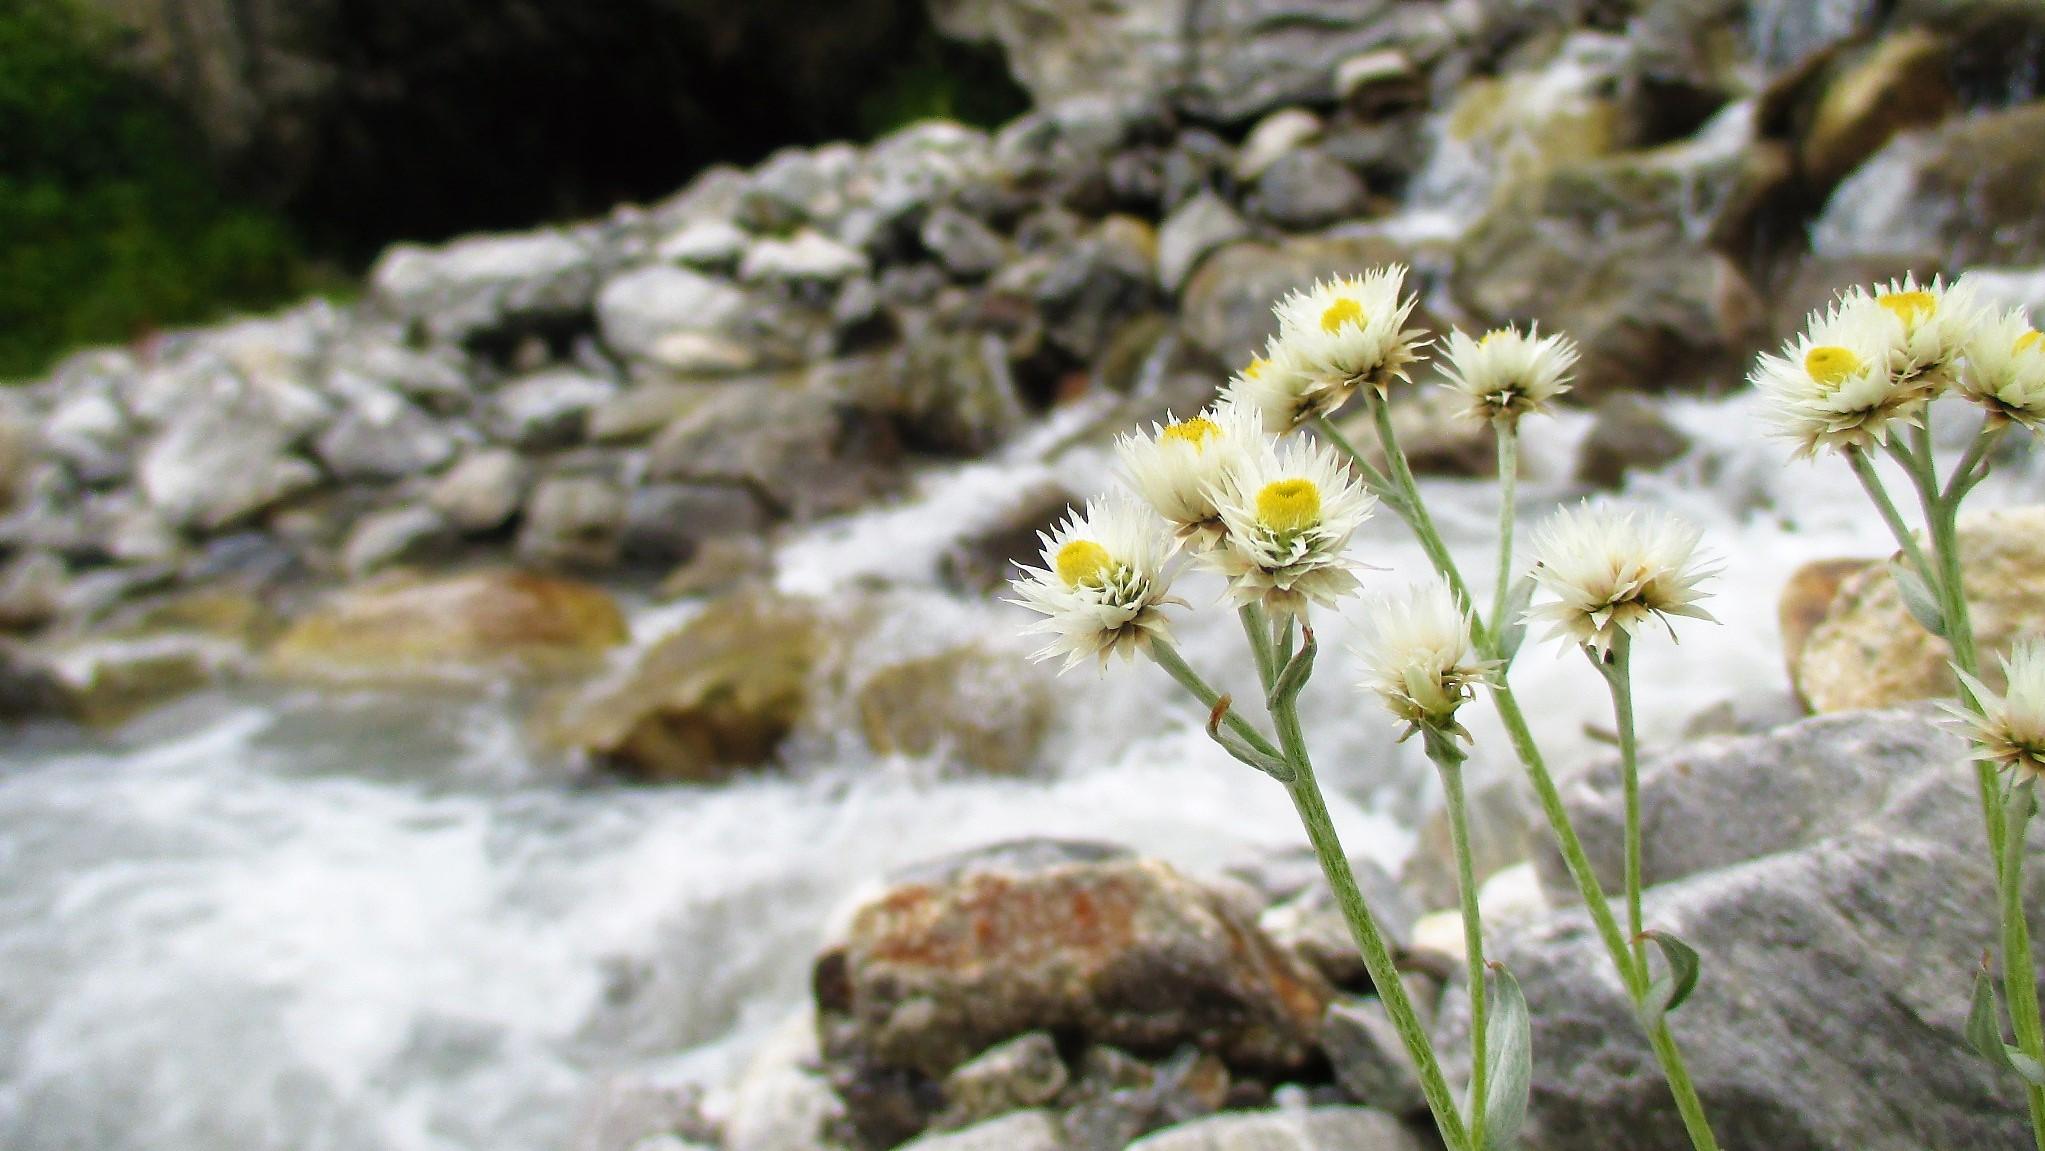 Nature - Pure & Close